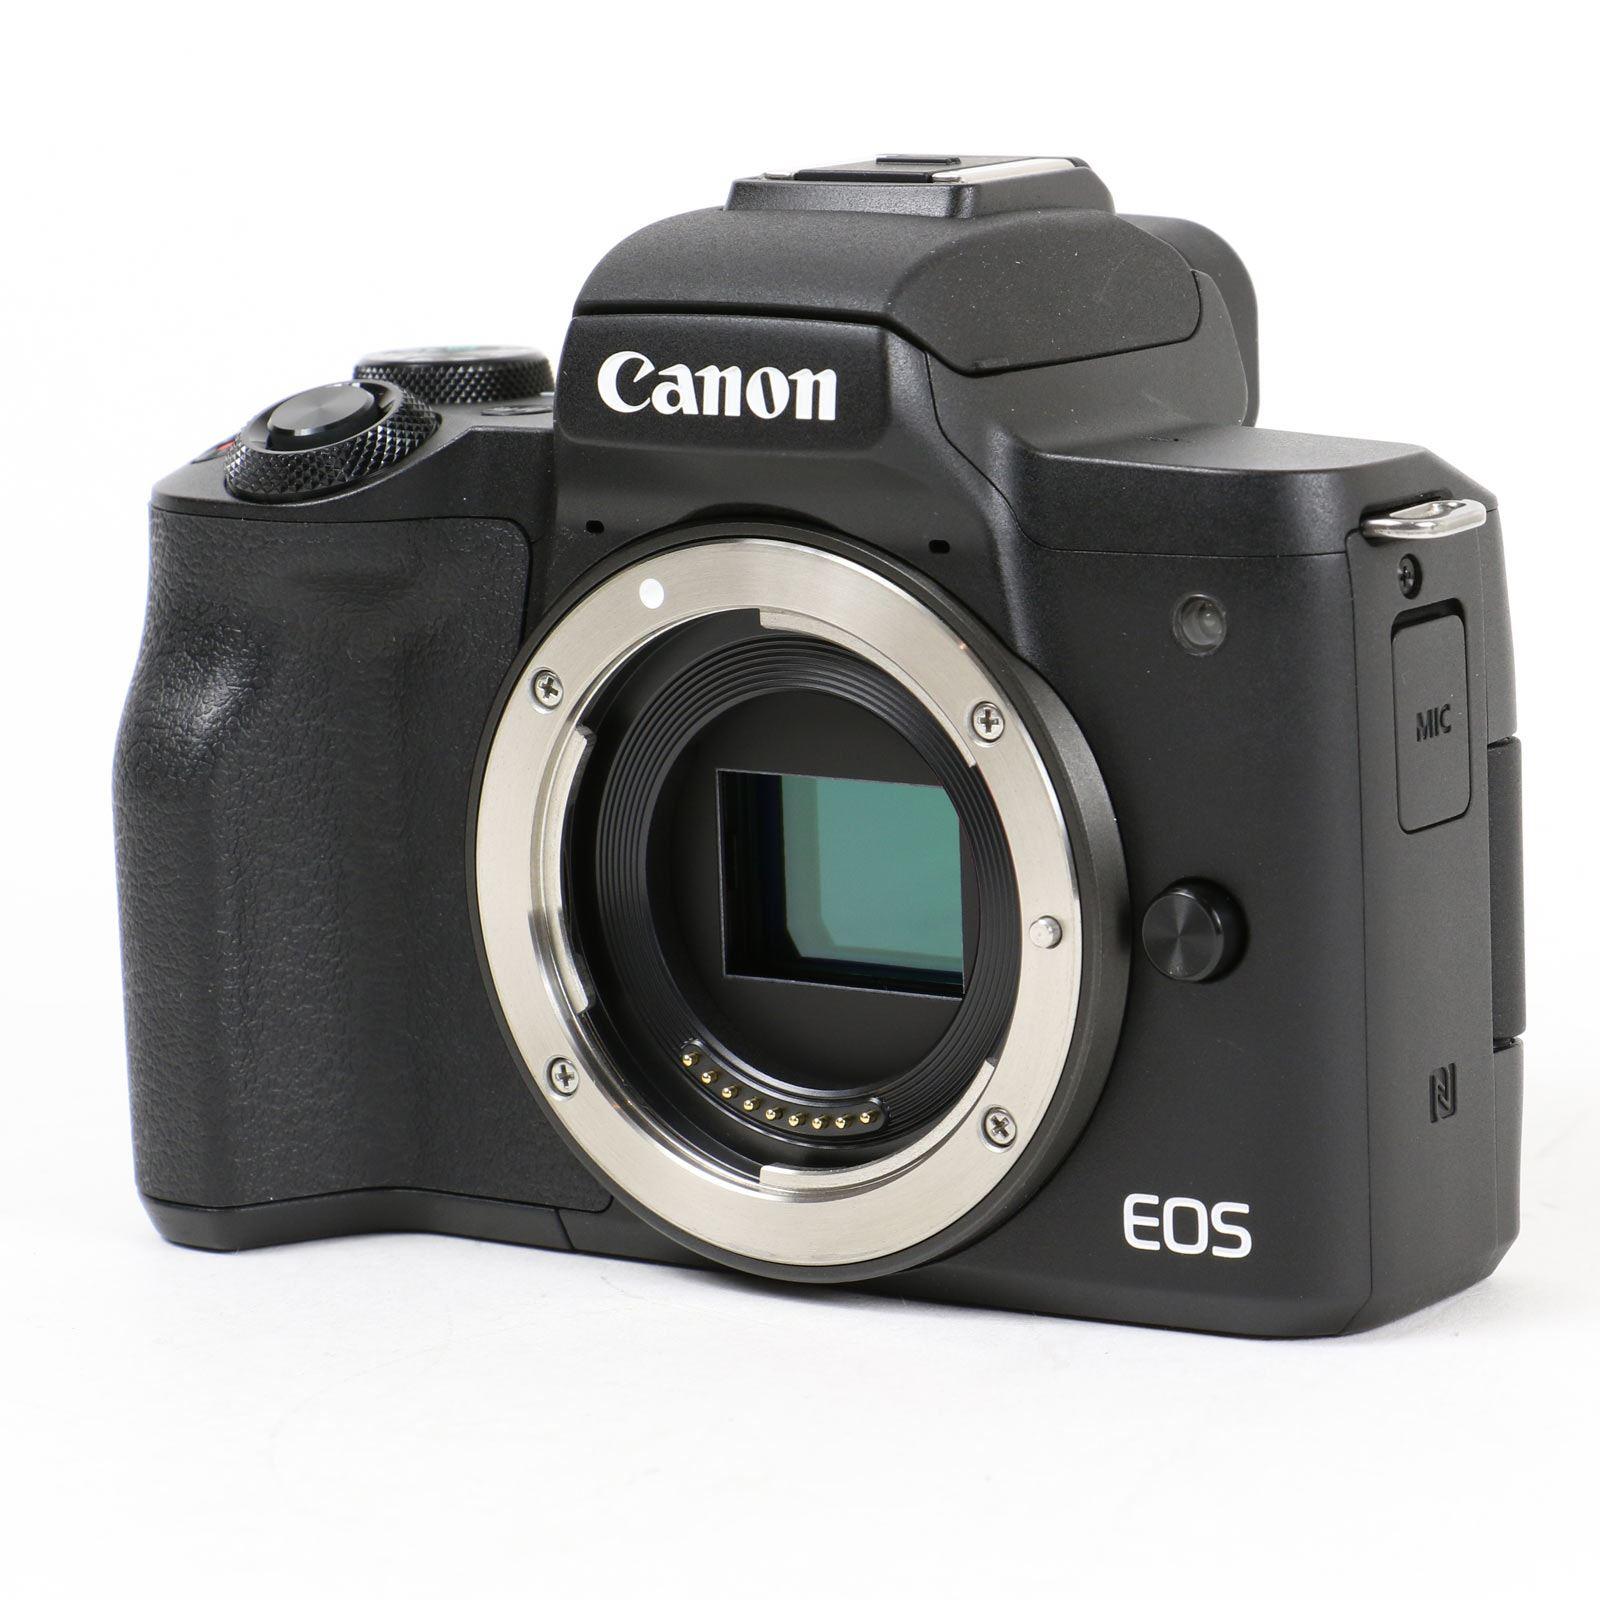 Image of Used Canon EOS M50 Digital Camera Body - Black